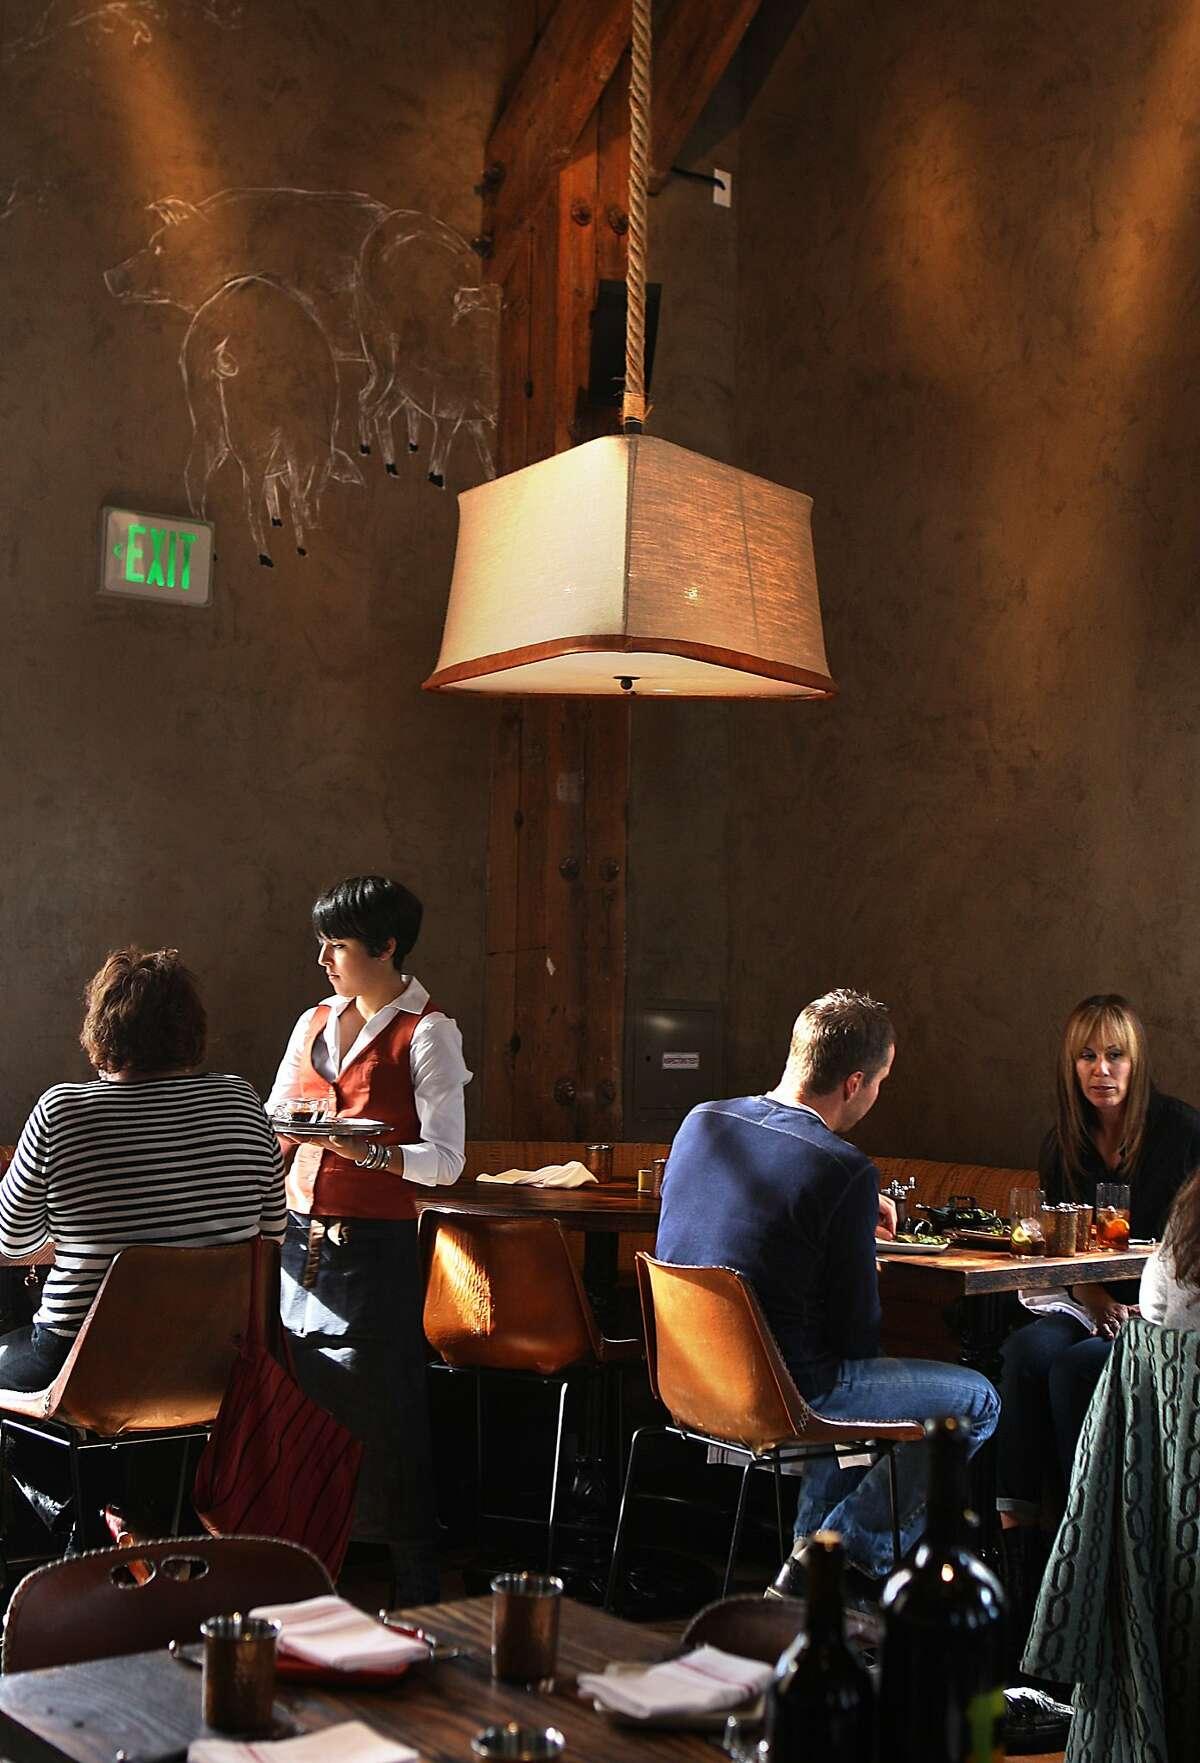 Alli Diaz serves lunch at Coqueta in San Francisco, California, on Thursday, November 14, 2013.